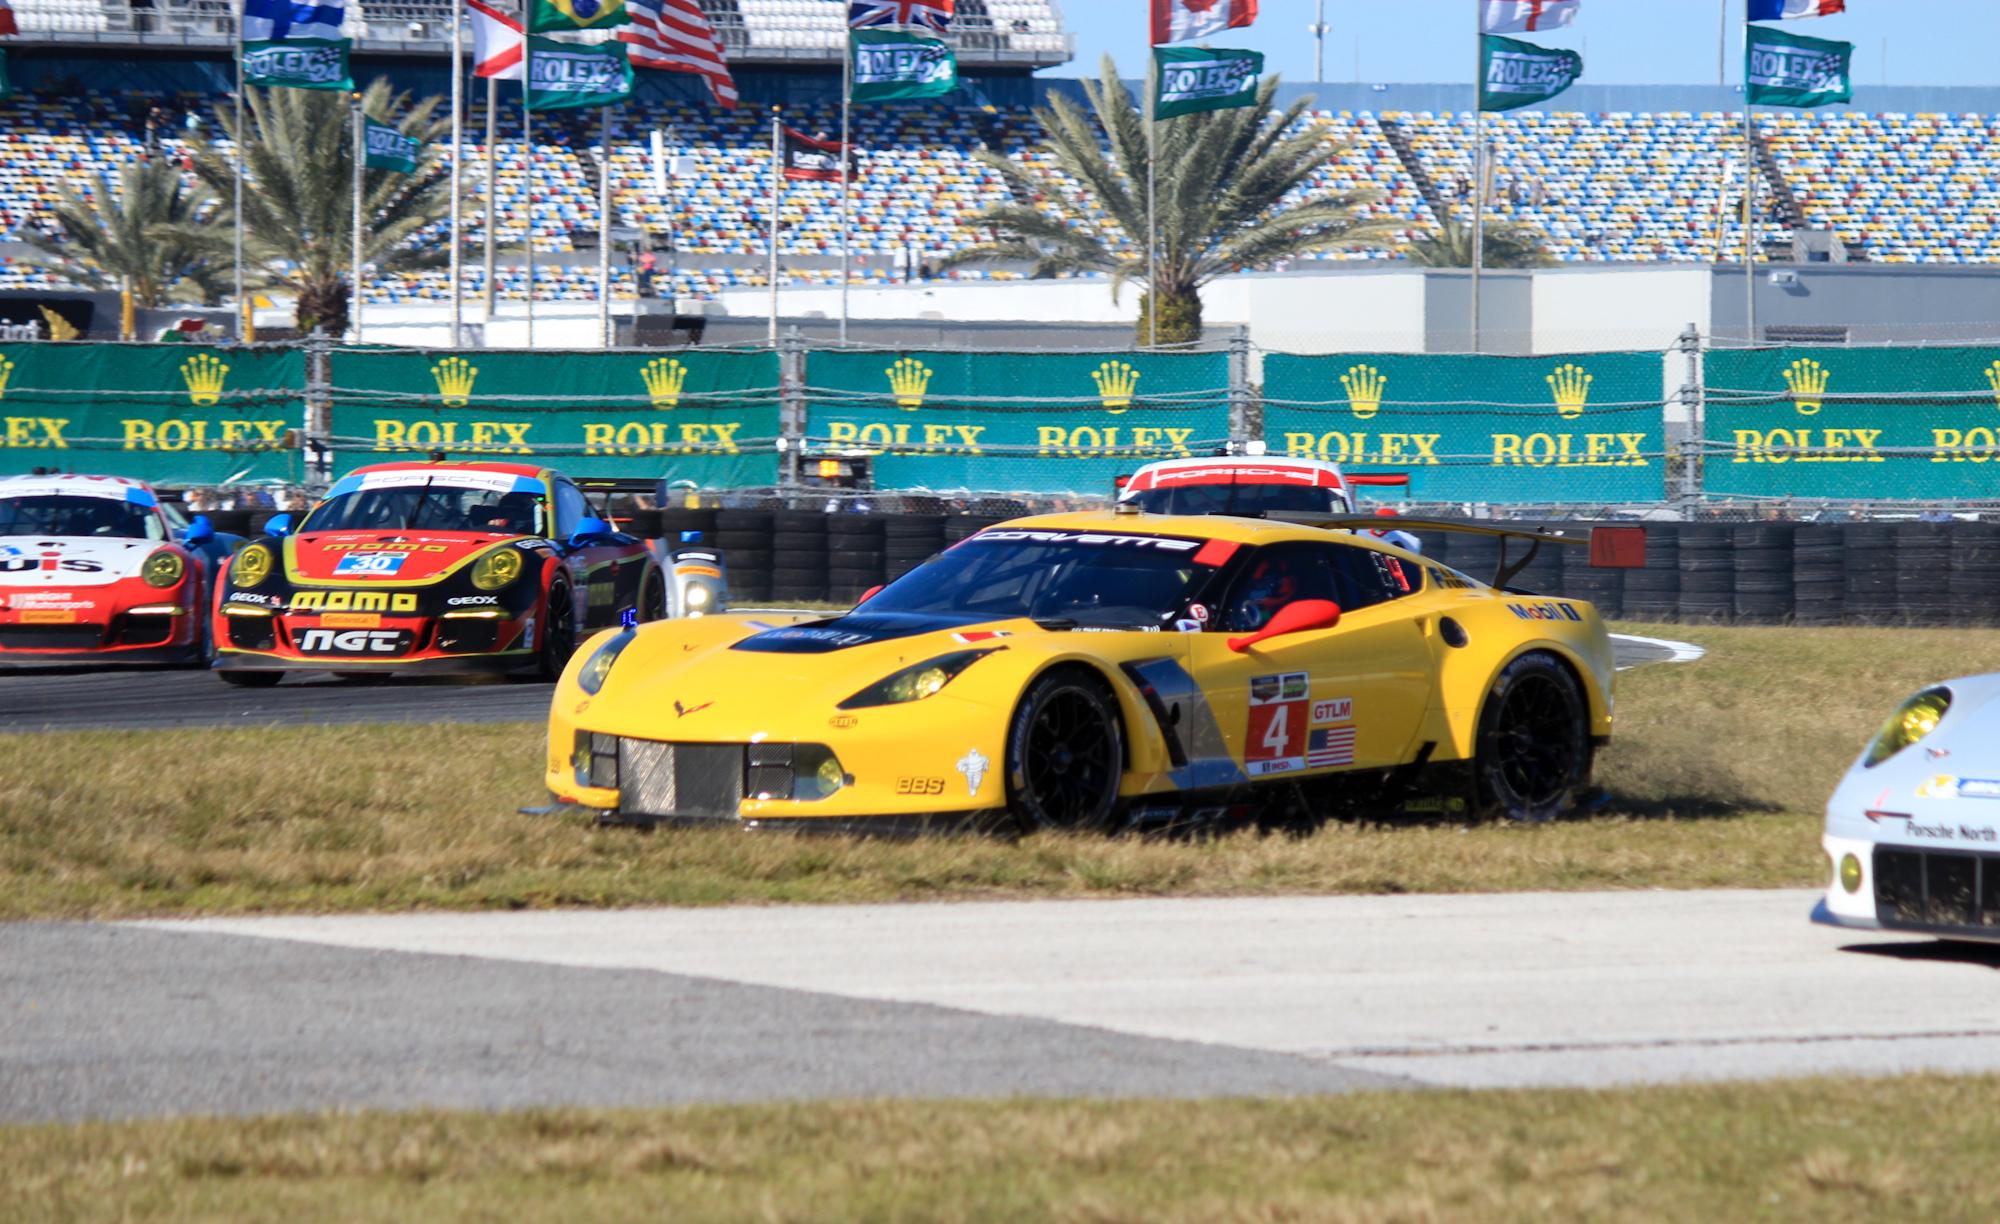 McLaren P15, Daytona 24 Hours, Infiniti Flagship Plans: Car News Headlines